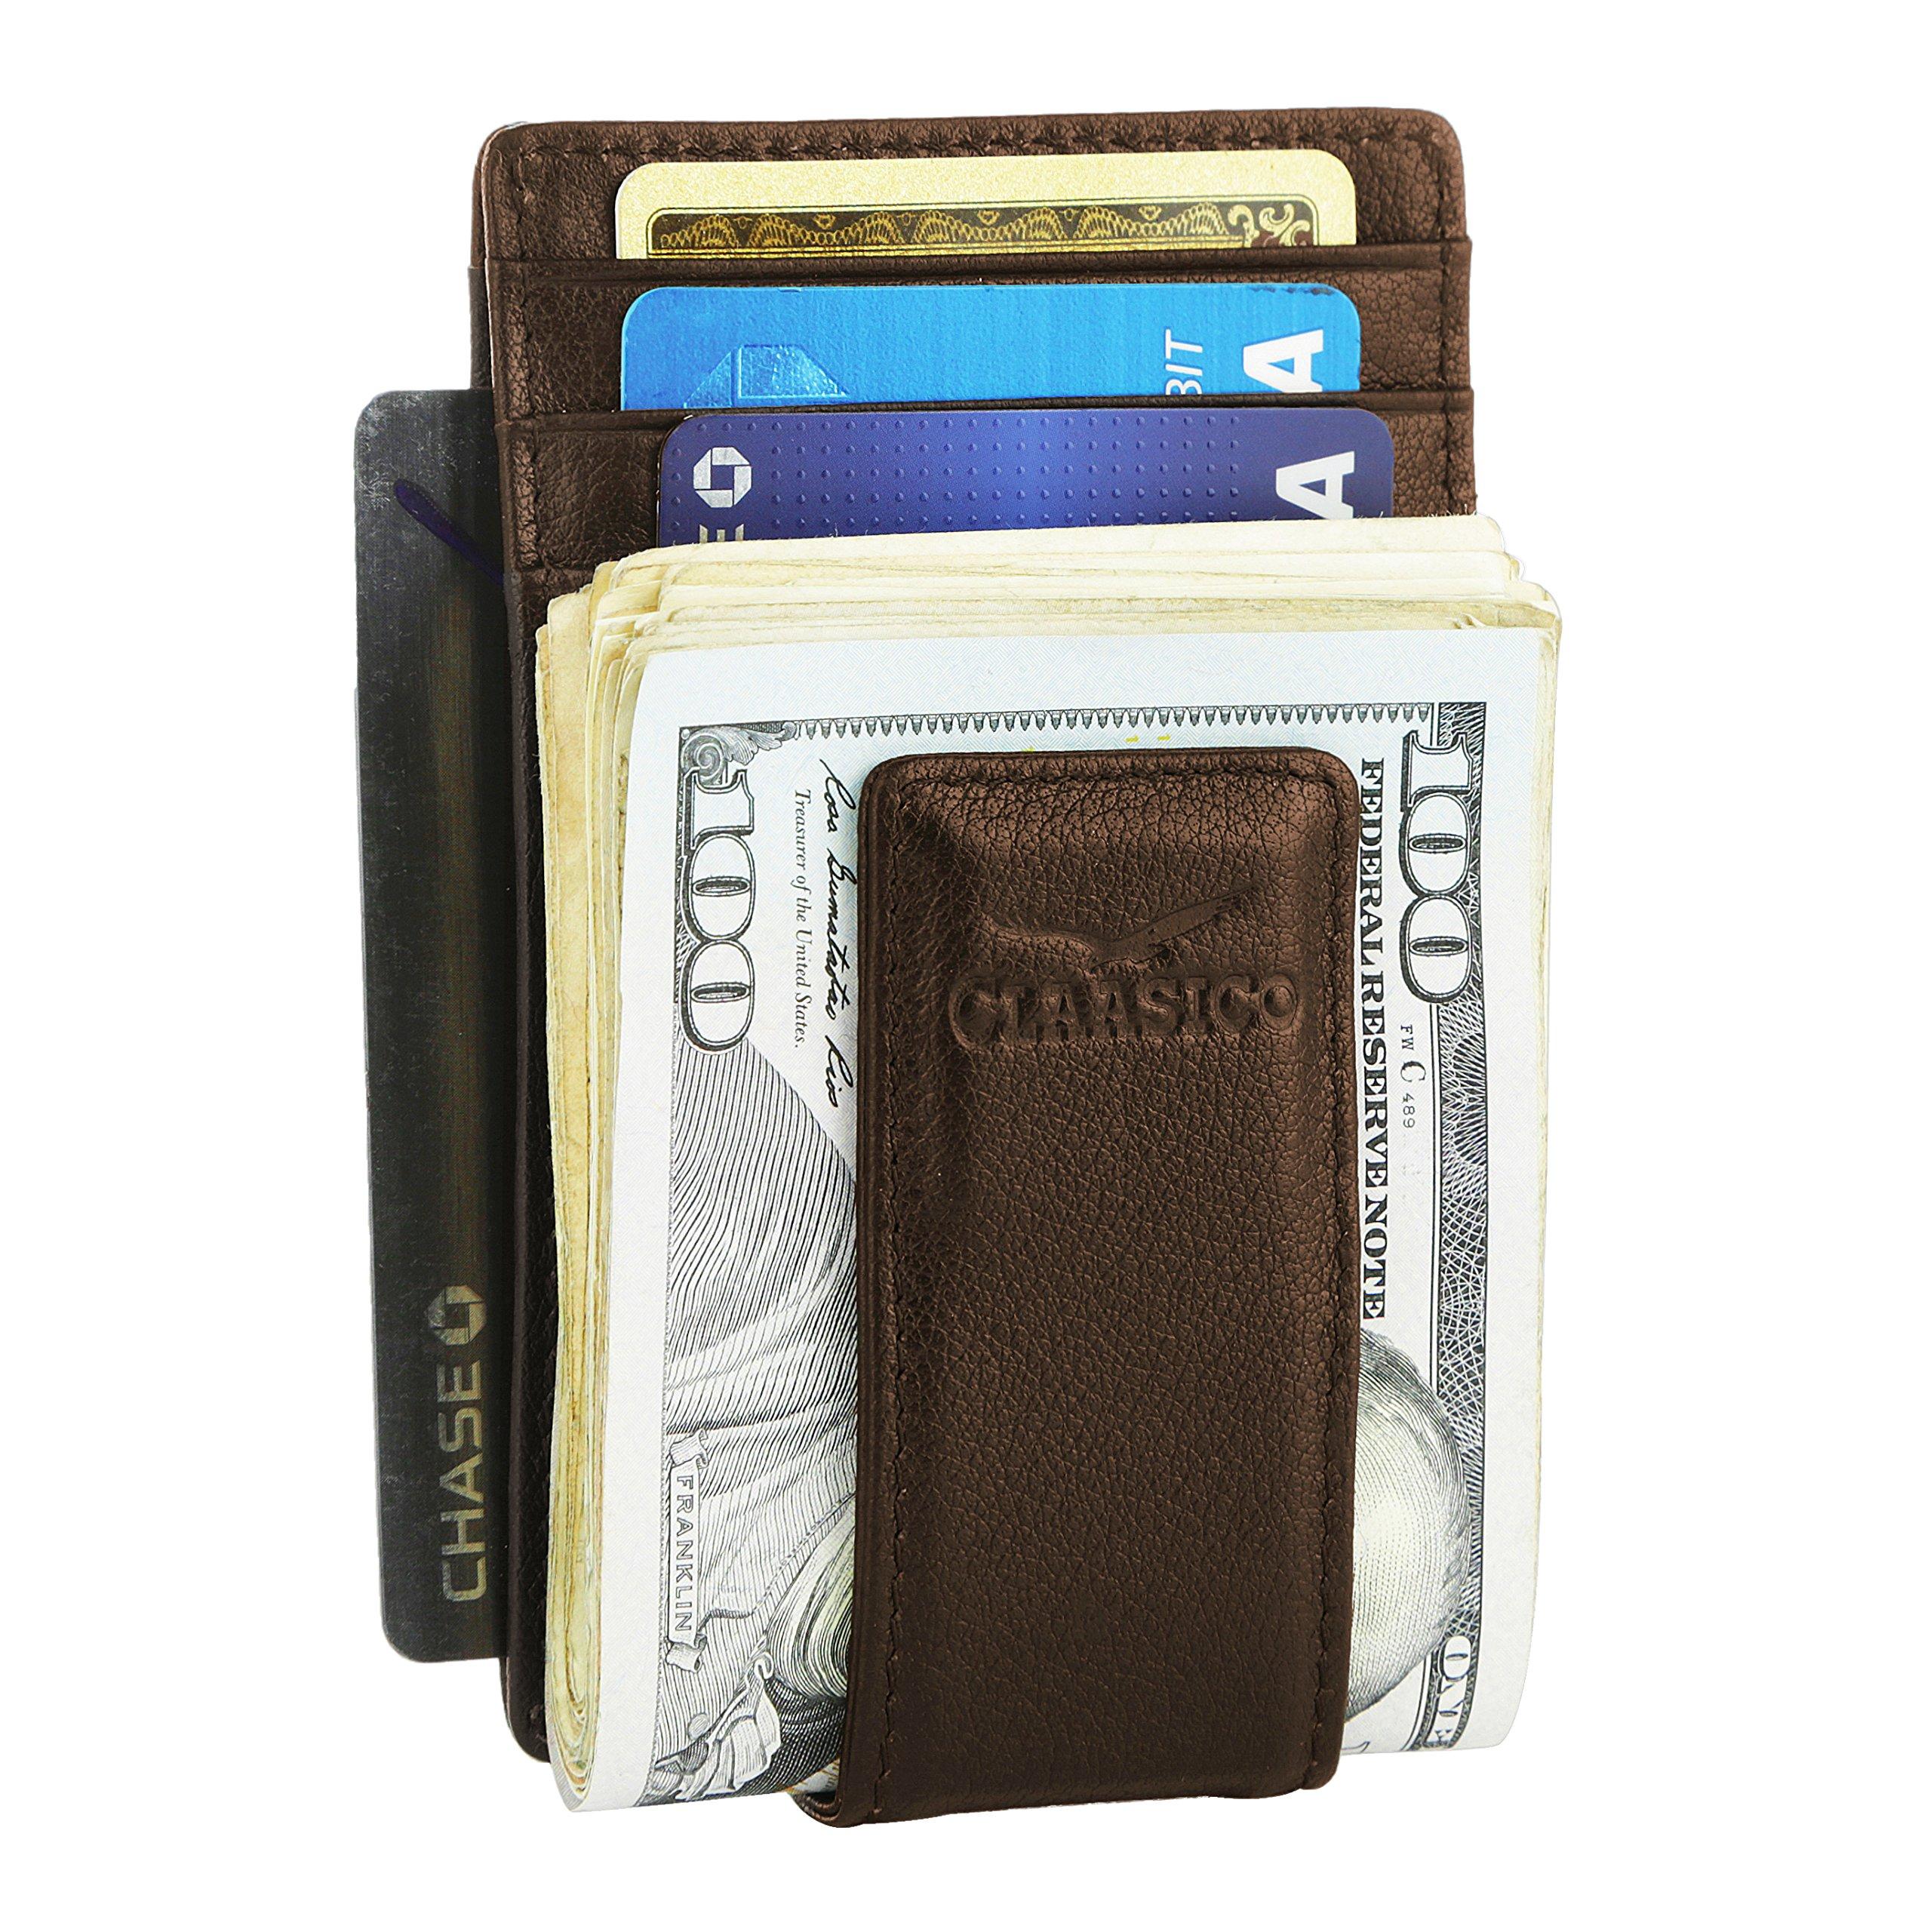 Money Clip Leather Wallet For Men Slim Front Pocket RFID Blocking Card Holder With Super Strong Magnetic (Brown)